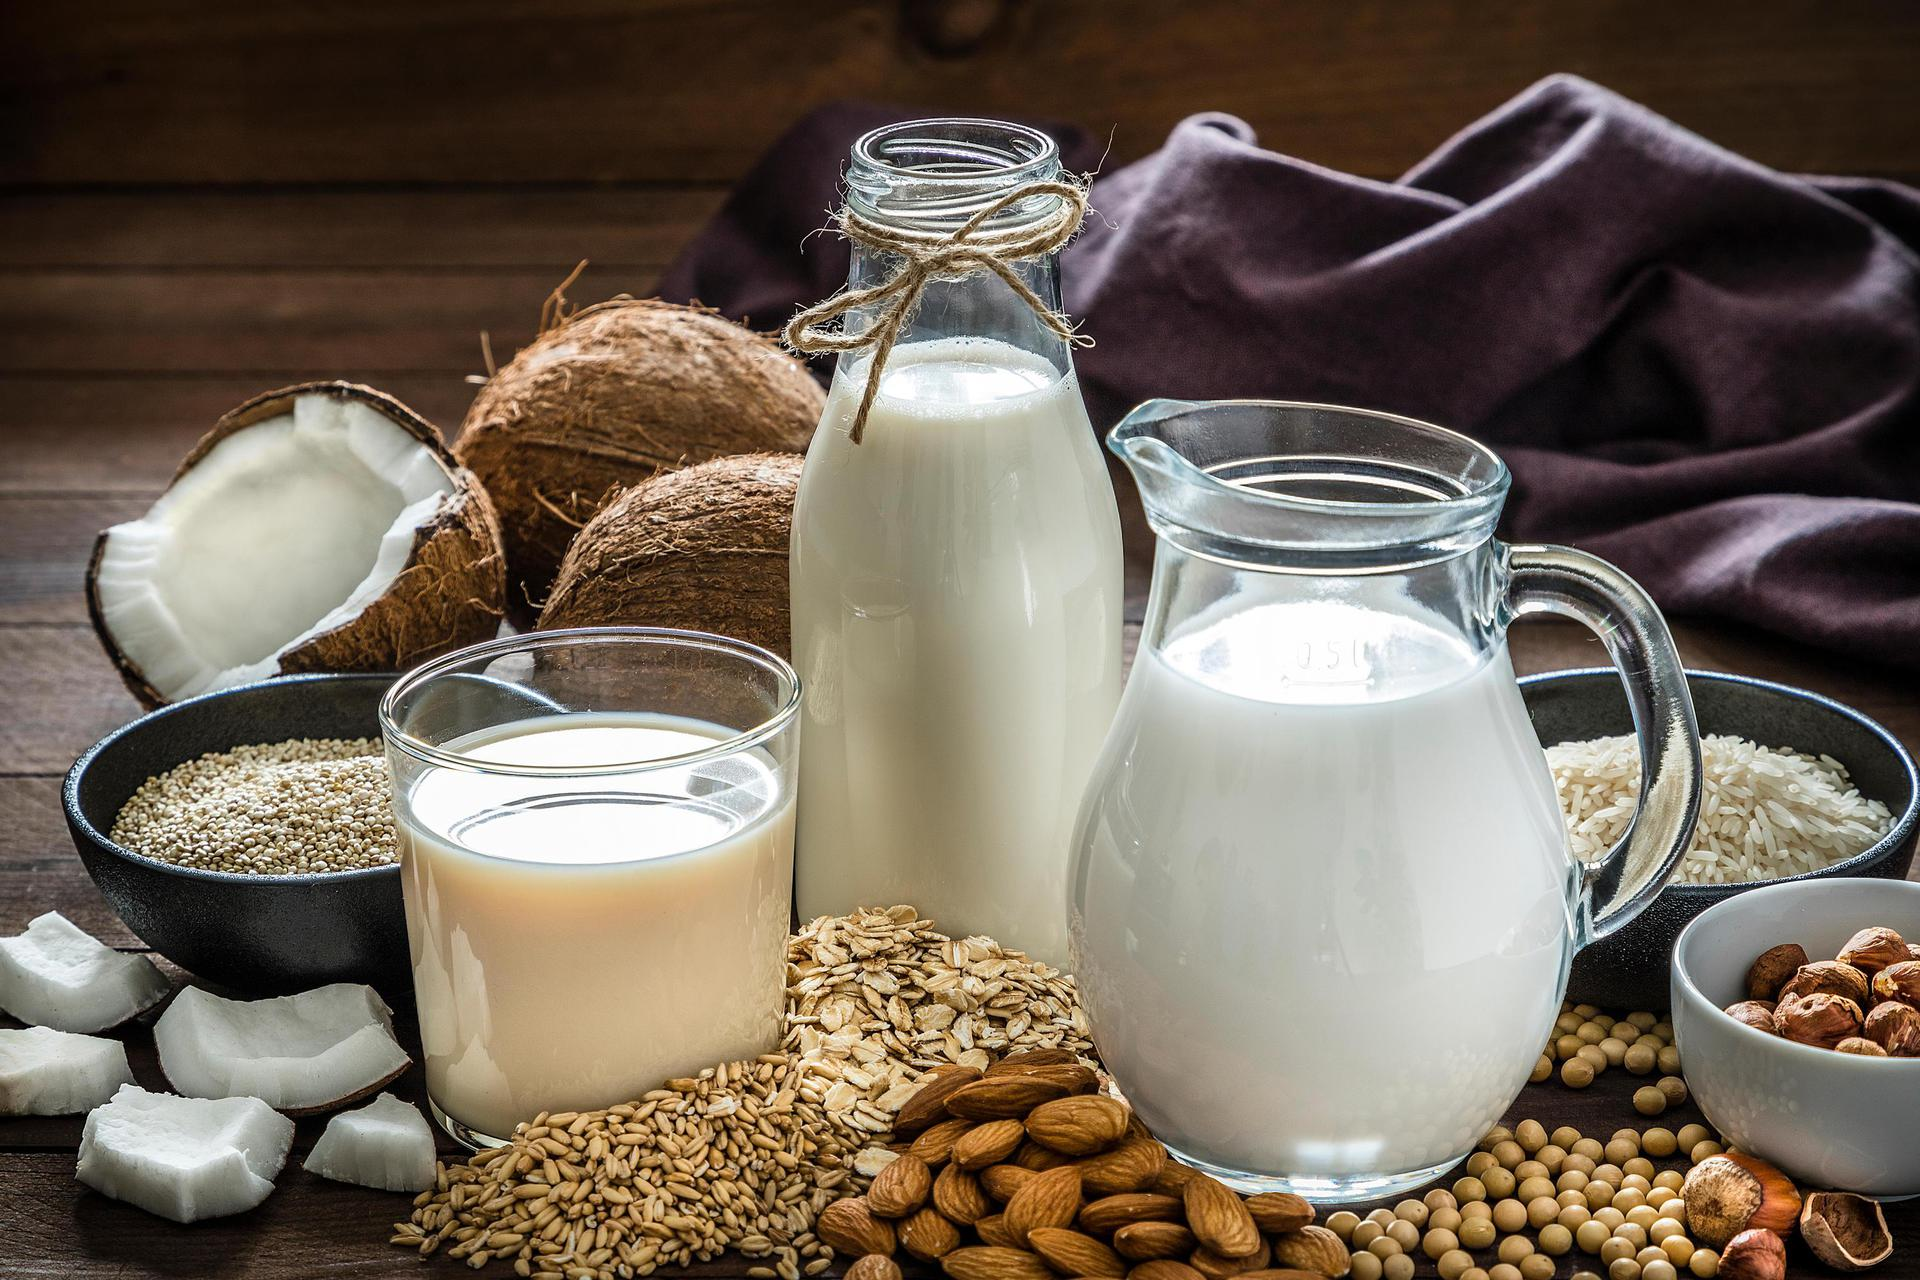 Latte senza lattosio Vs latte vegetale